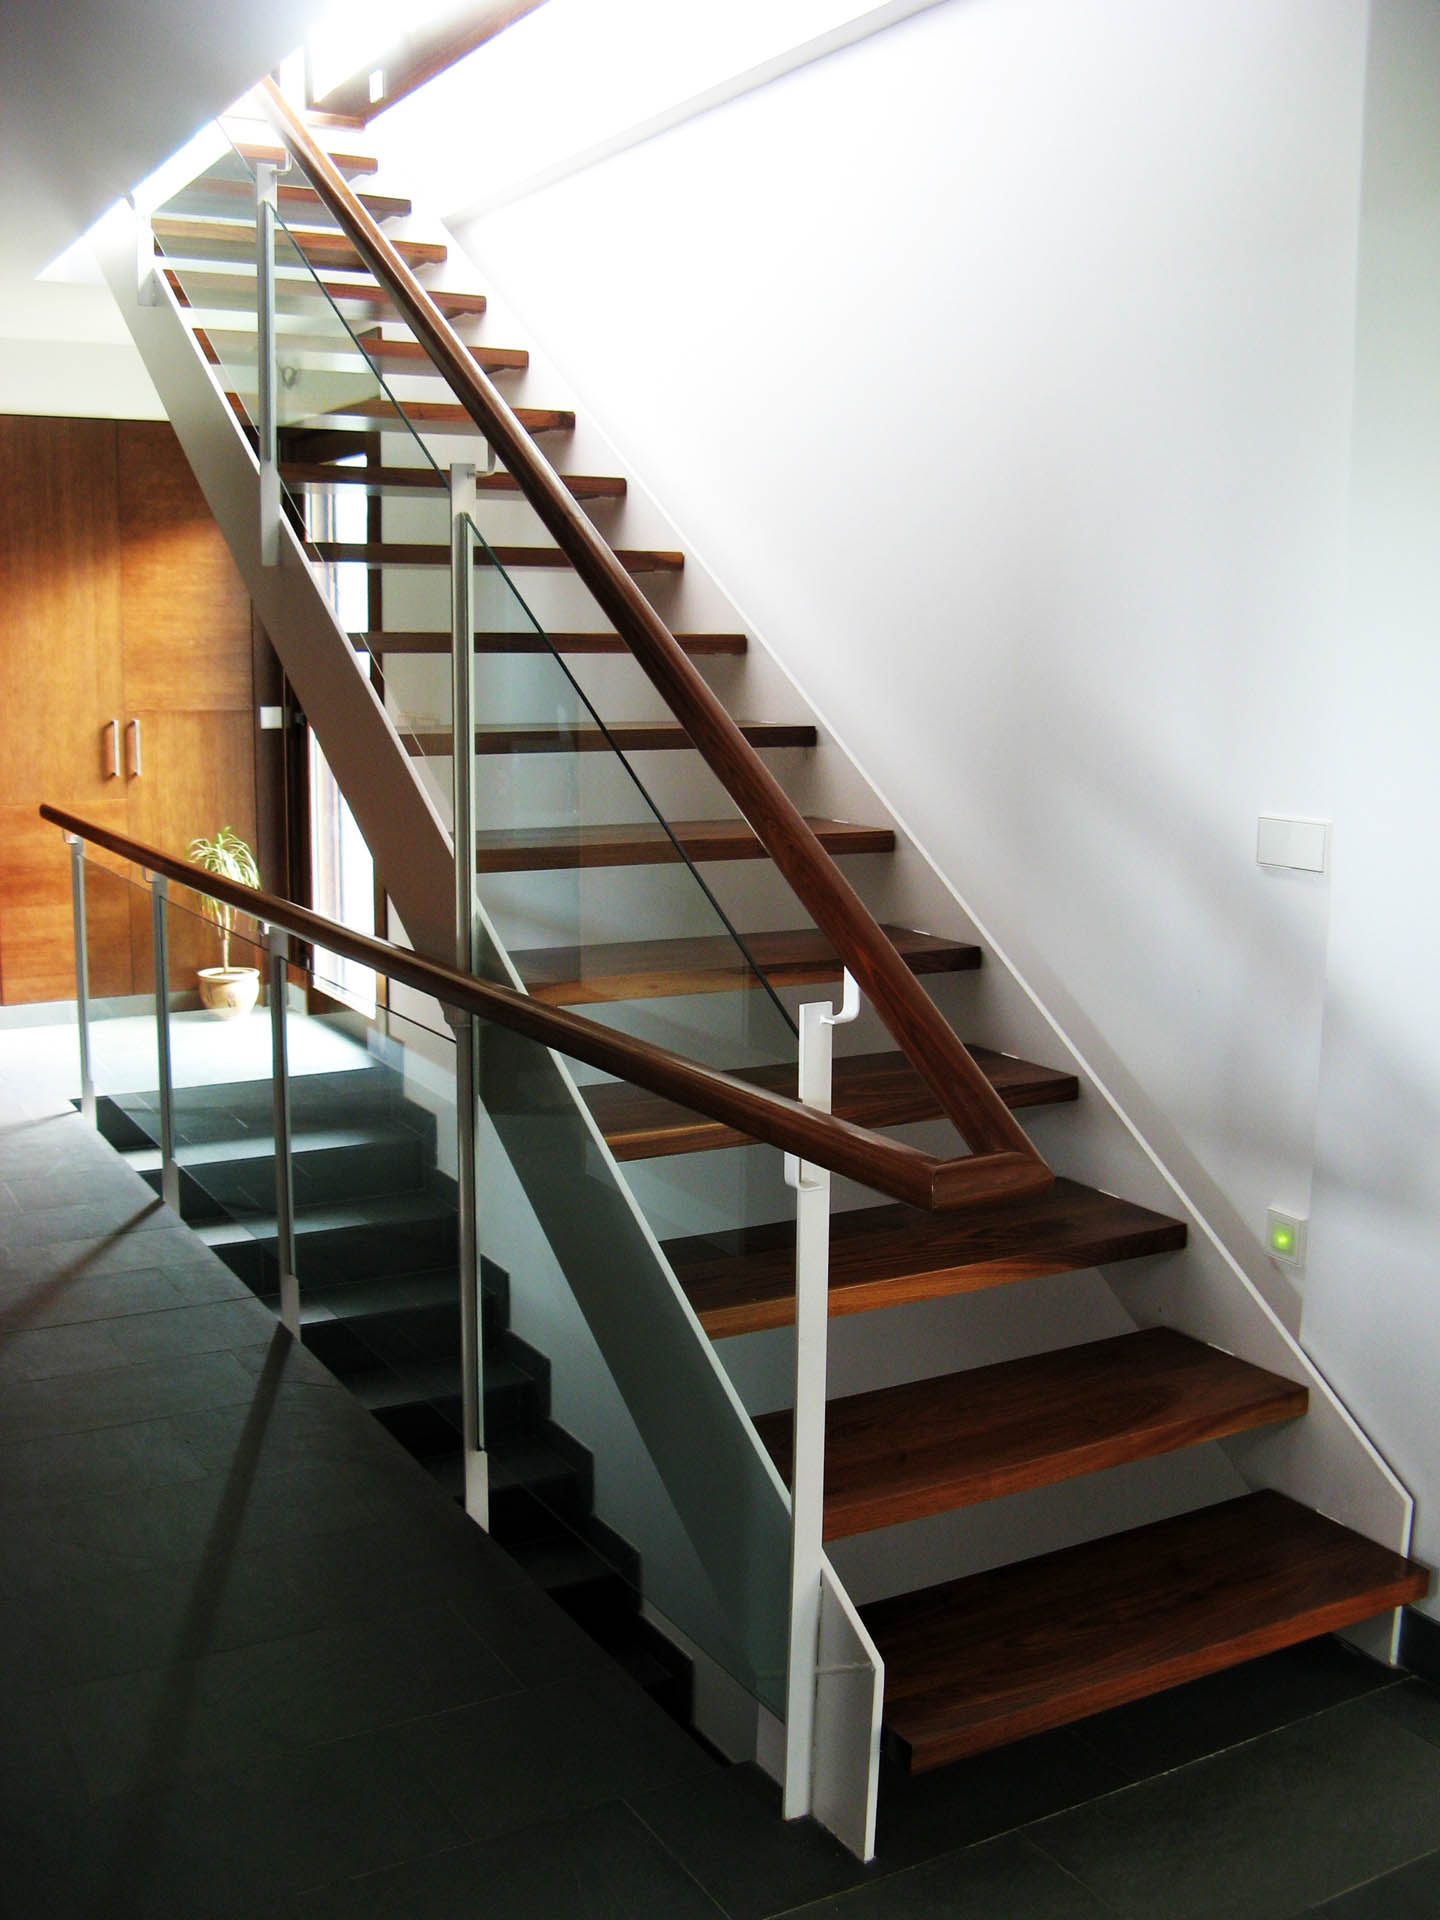 Escaleras intra arquitectos Modelo de viviendas para construir